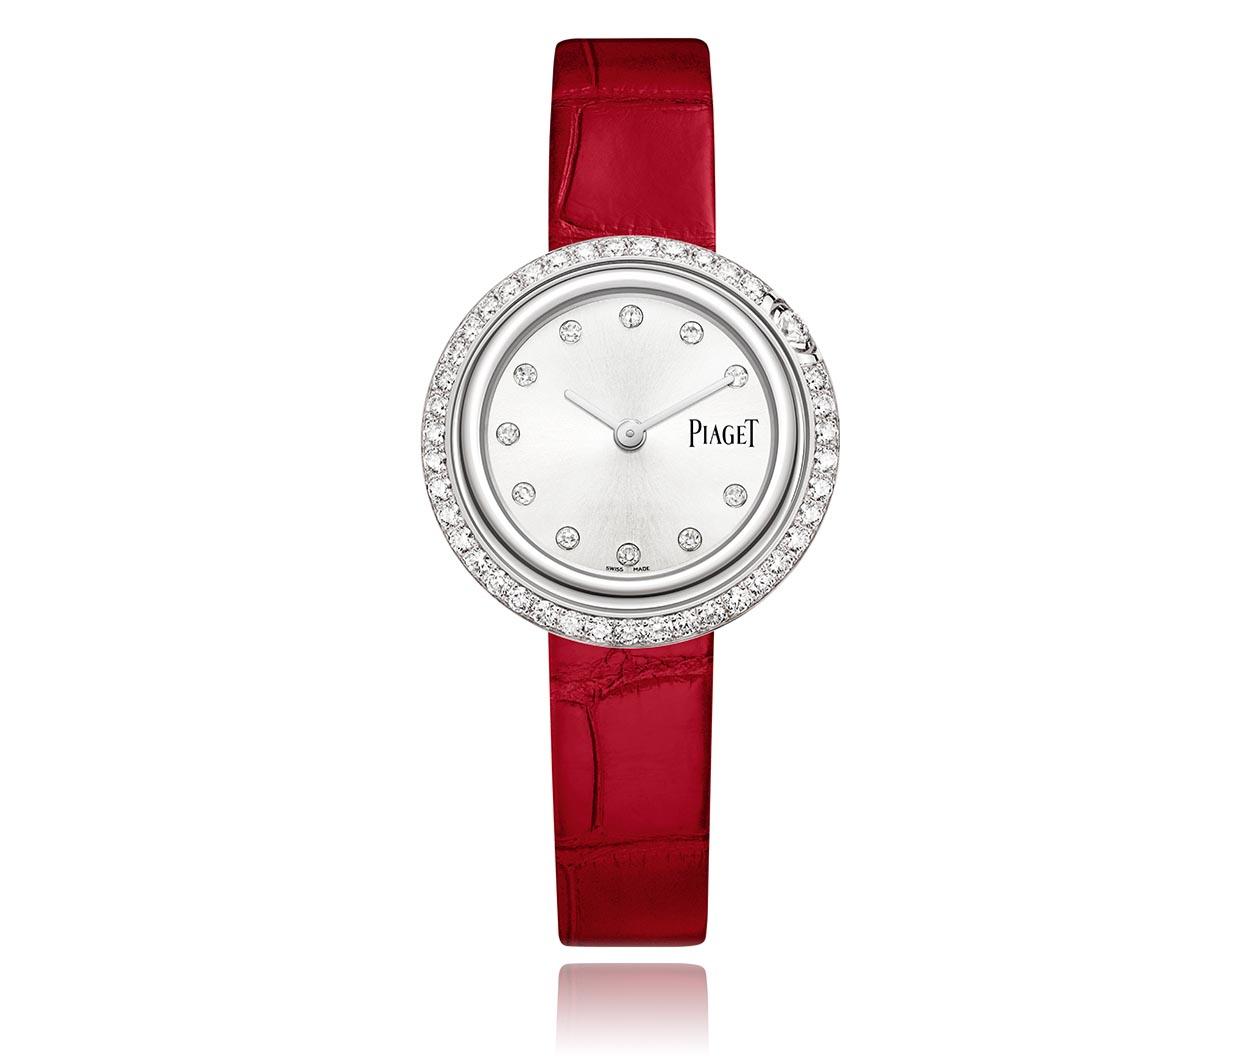 Piaget Possession watch G0A43084 Flatlay FINAL